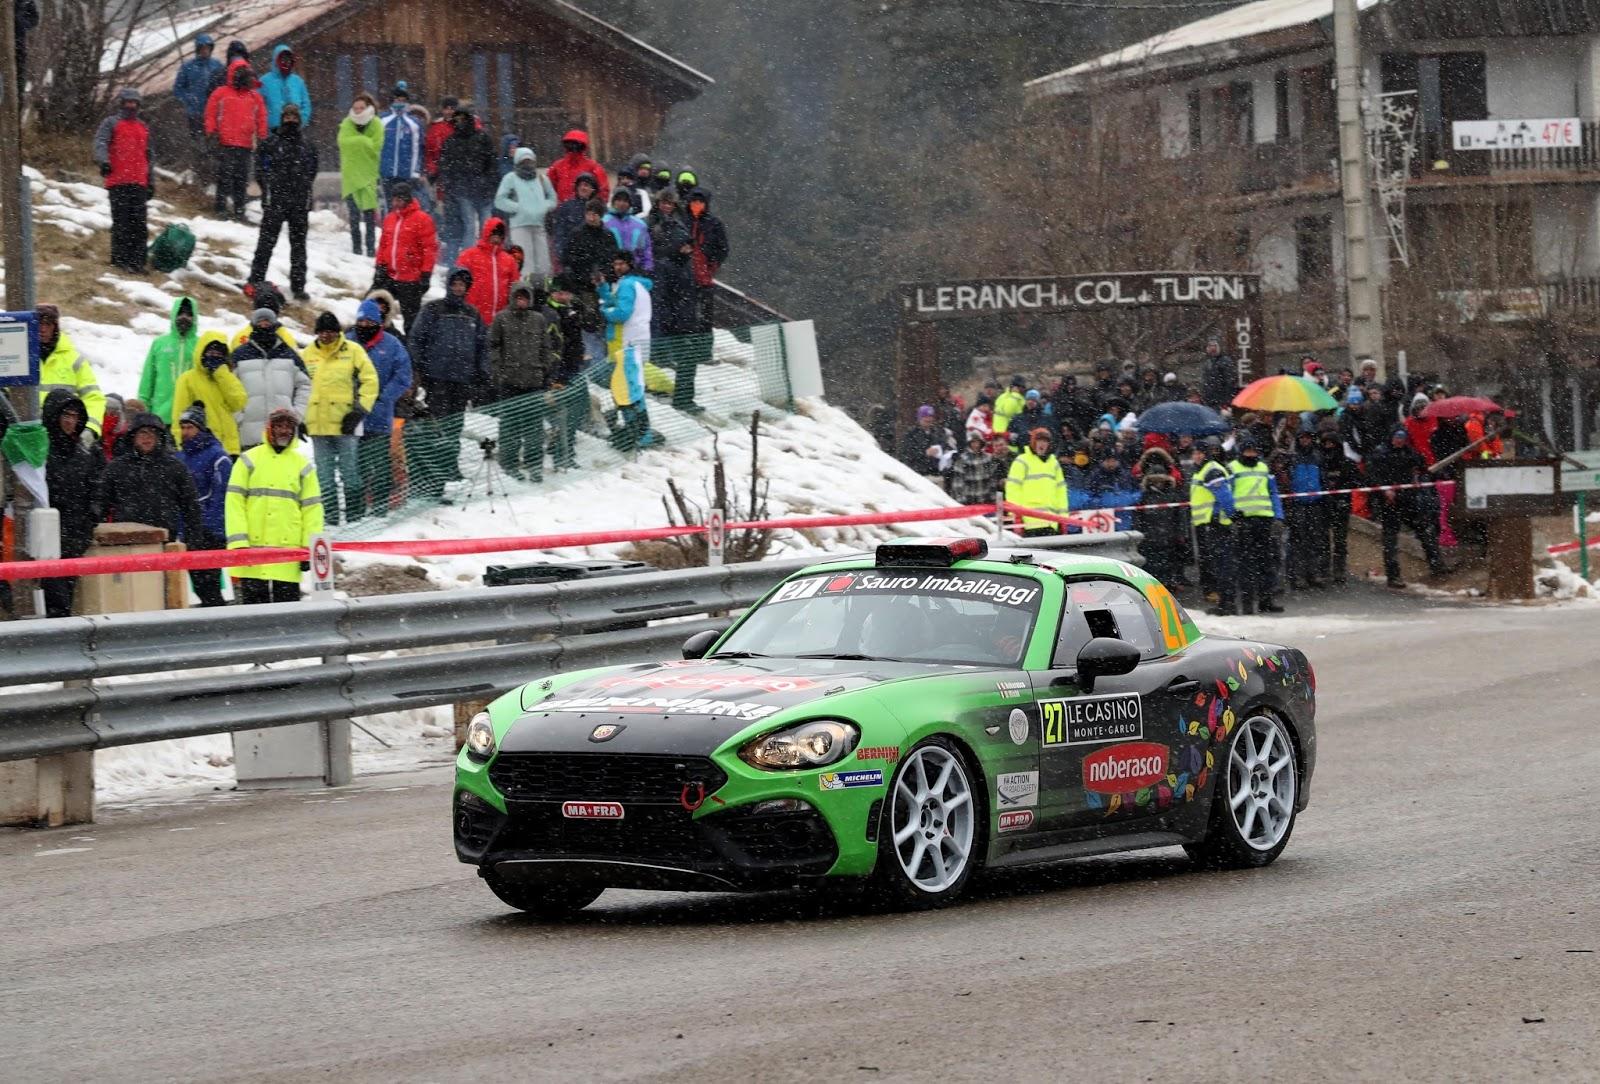 170123 Abarth Noberasco Θετική παρουσία για το Abarth 124 rally στην αγωνιστική του πρεμιέρα στο 85ο Rally του Monte Carlo Abarth, Abarth 124, Abarth 124 Rally, Fiat, Rally, Rallye Automobile Monte Carlo